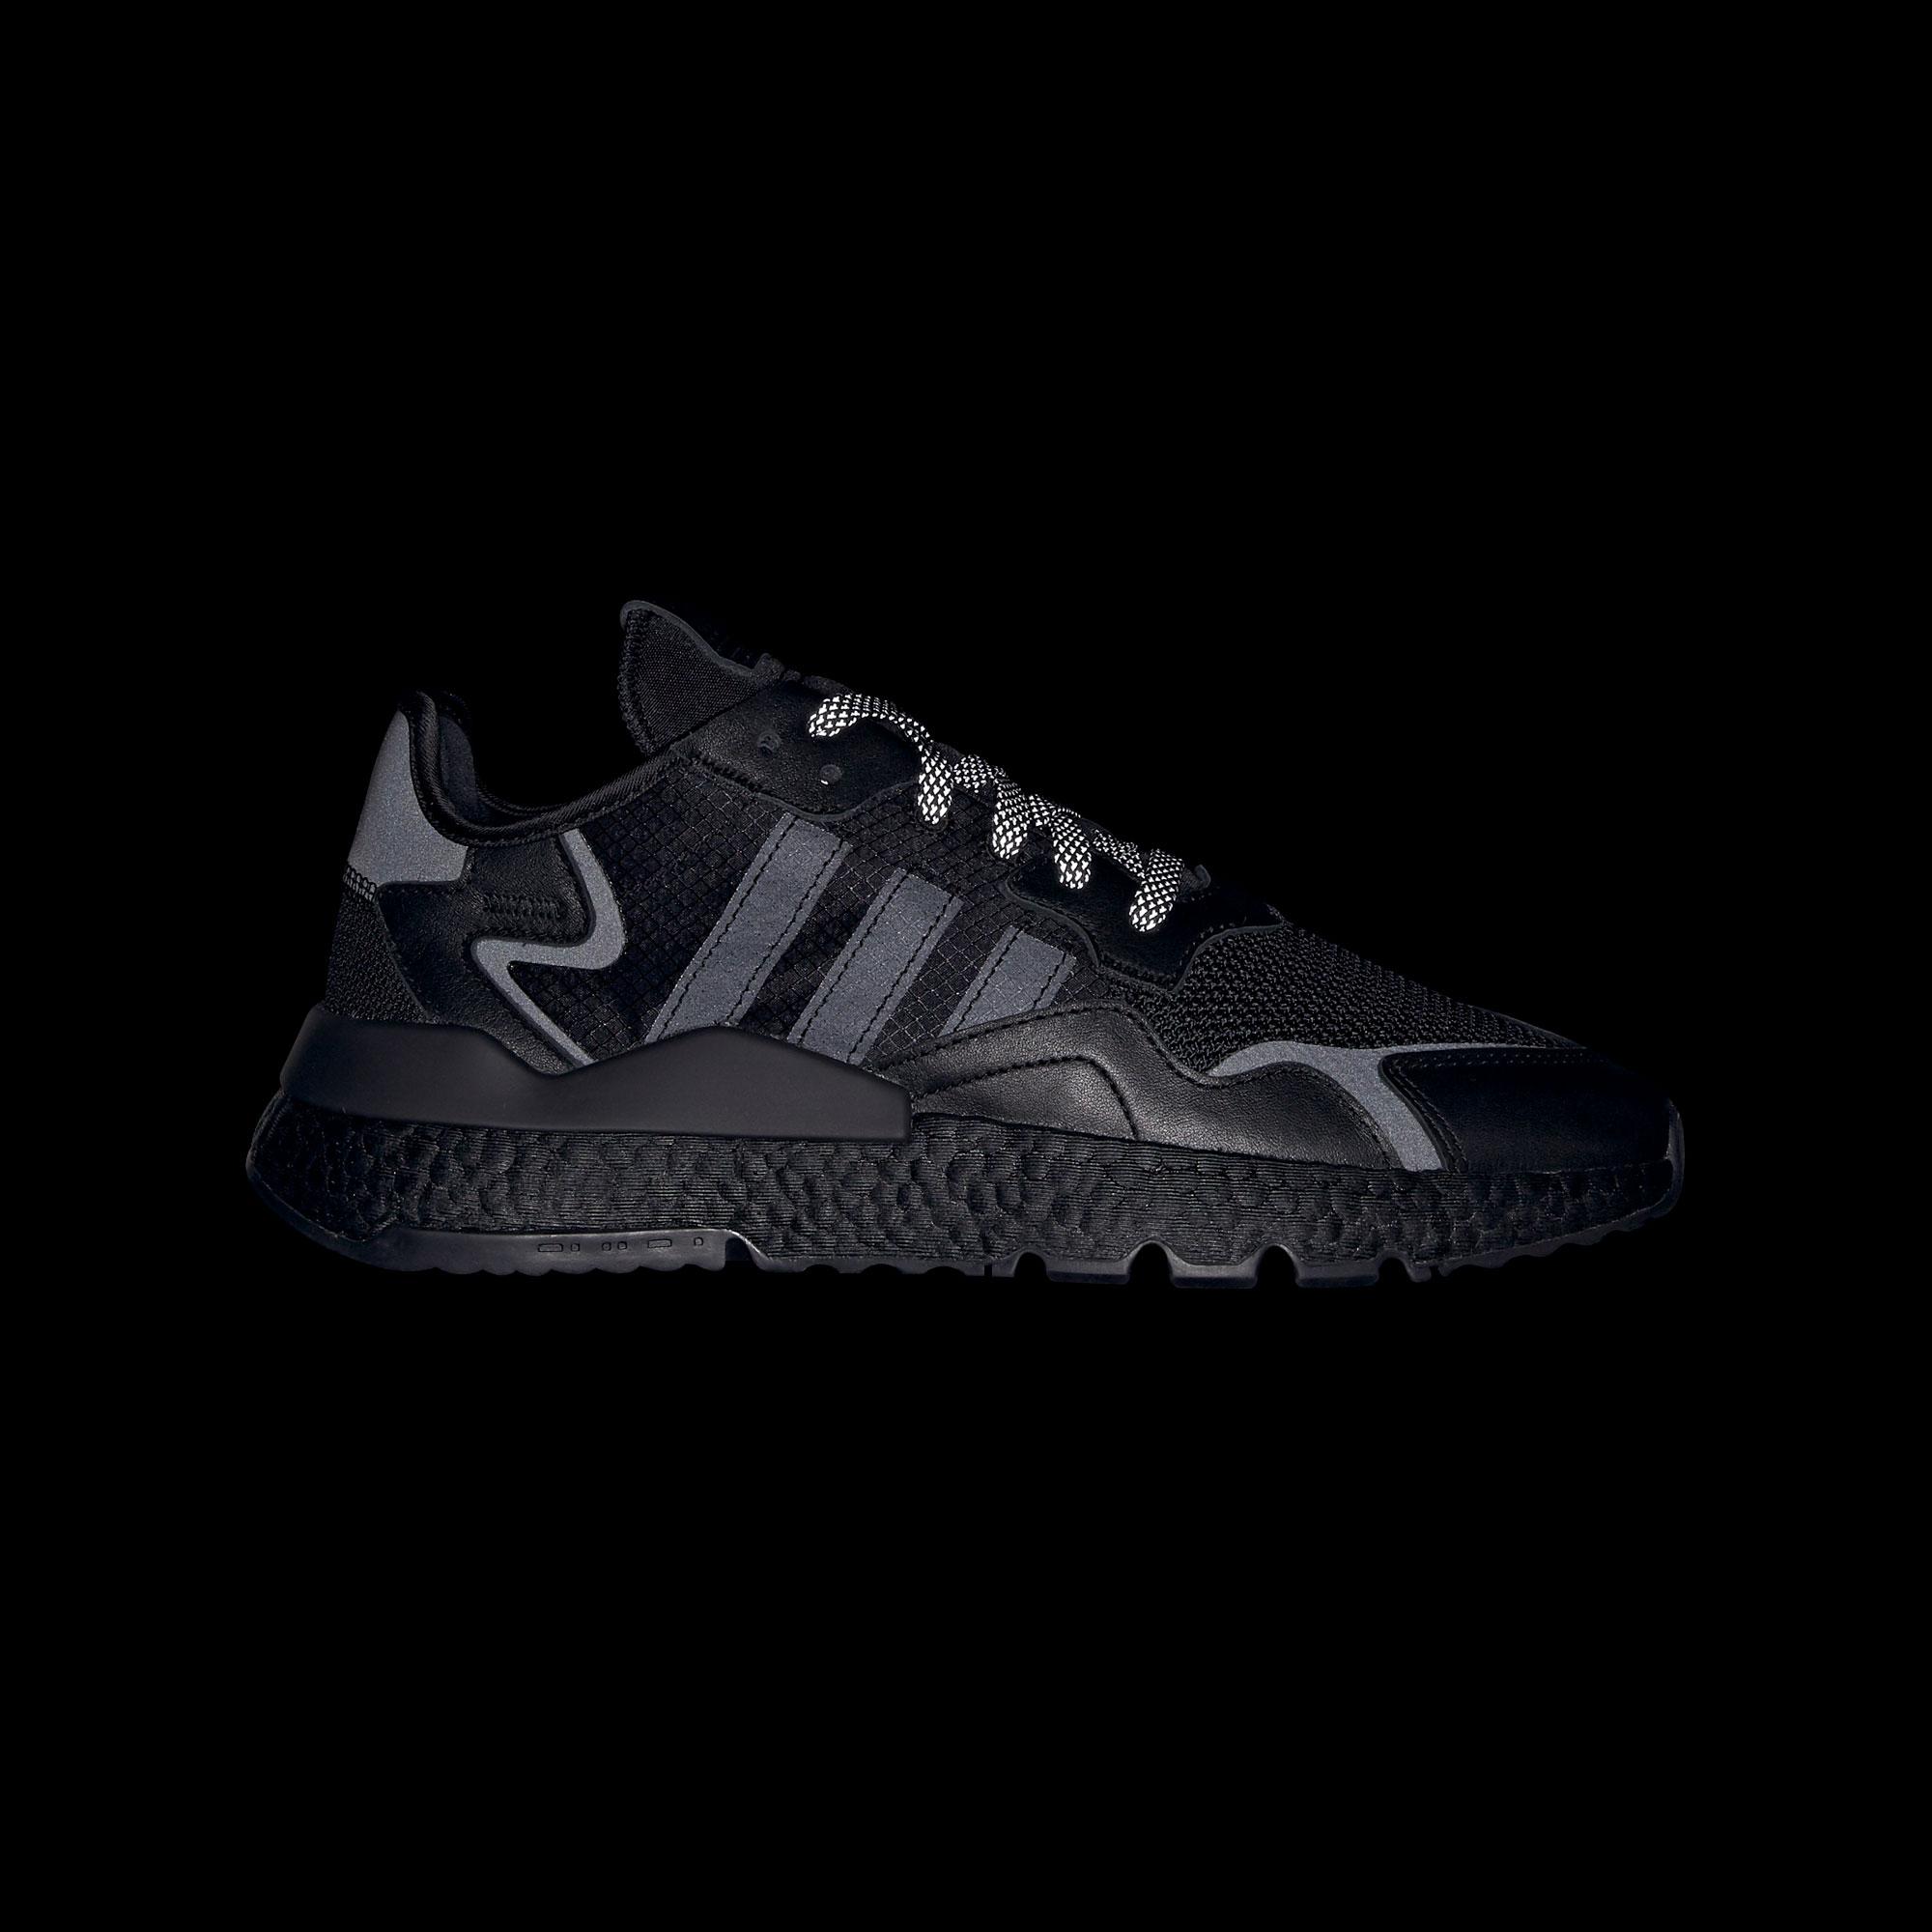 adidas Nite Jogger Unisex Siyah Spor Ayakkabı